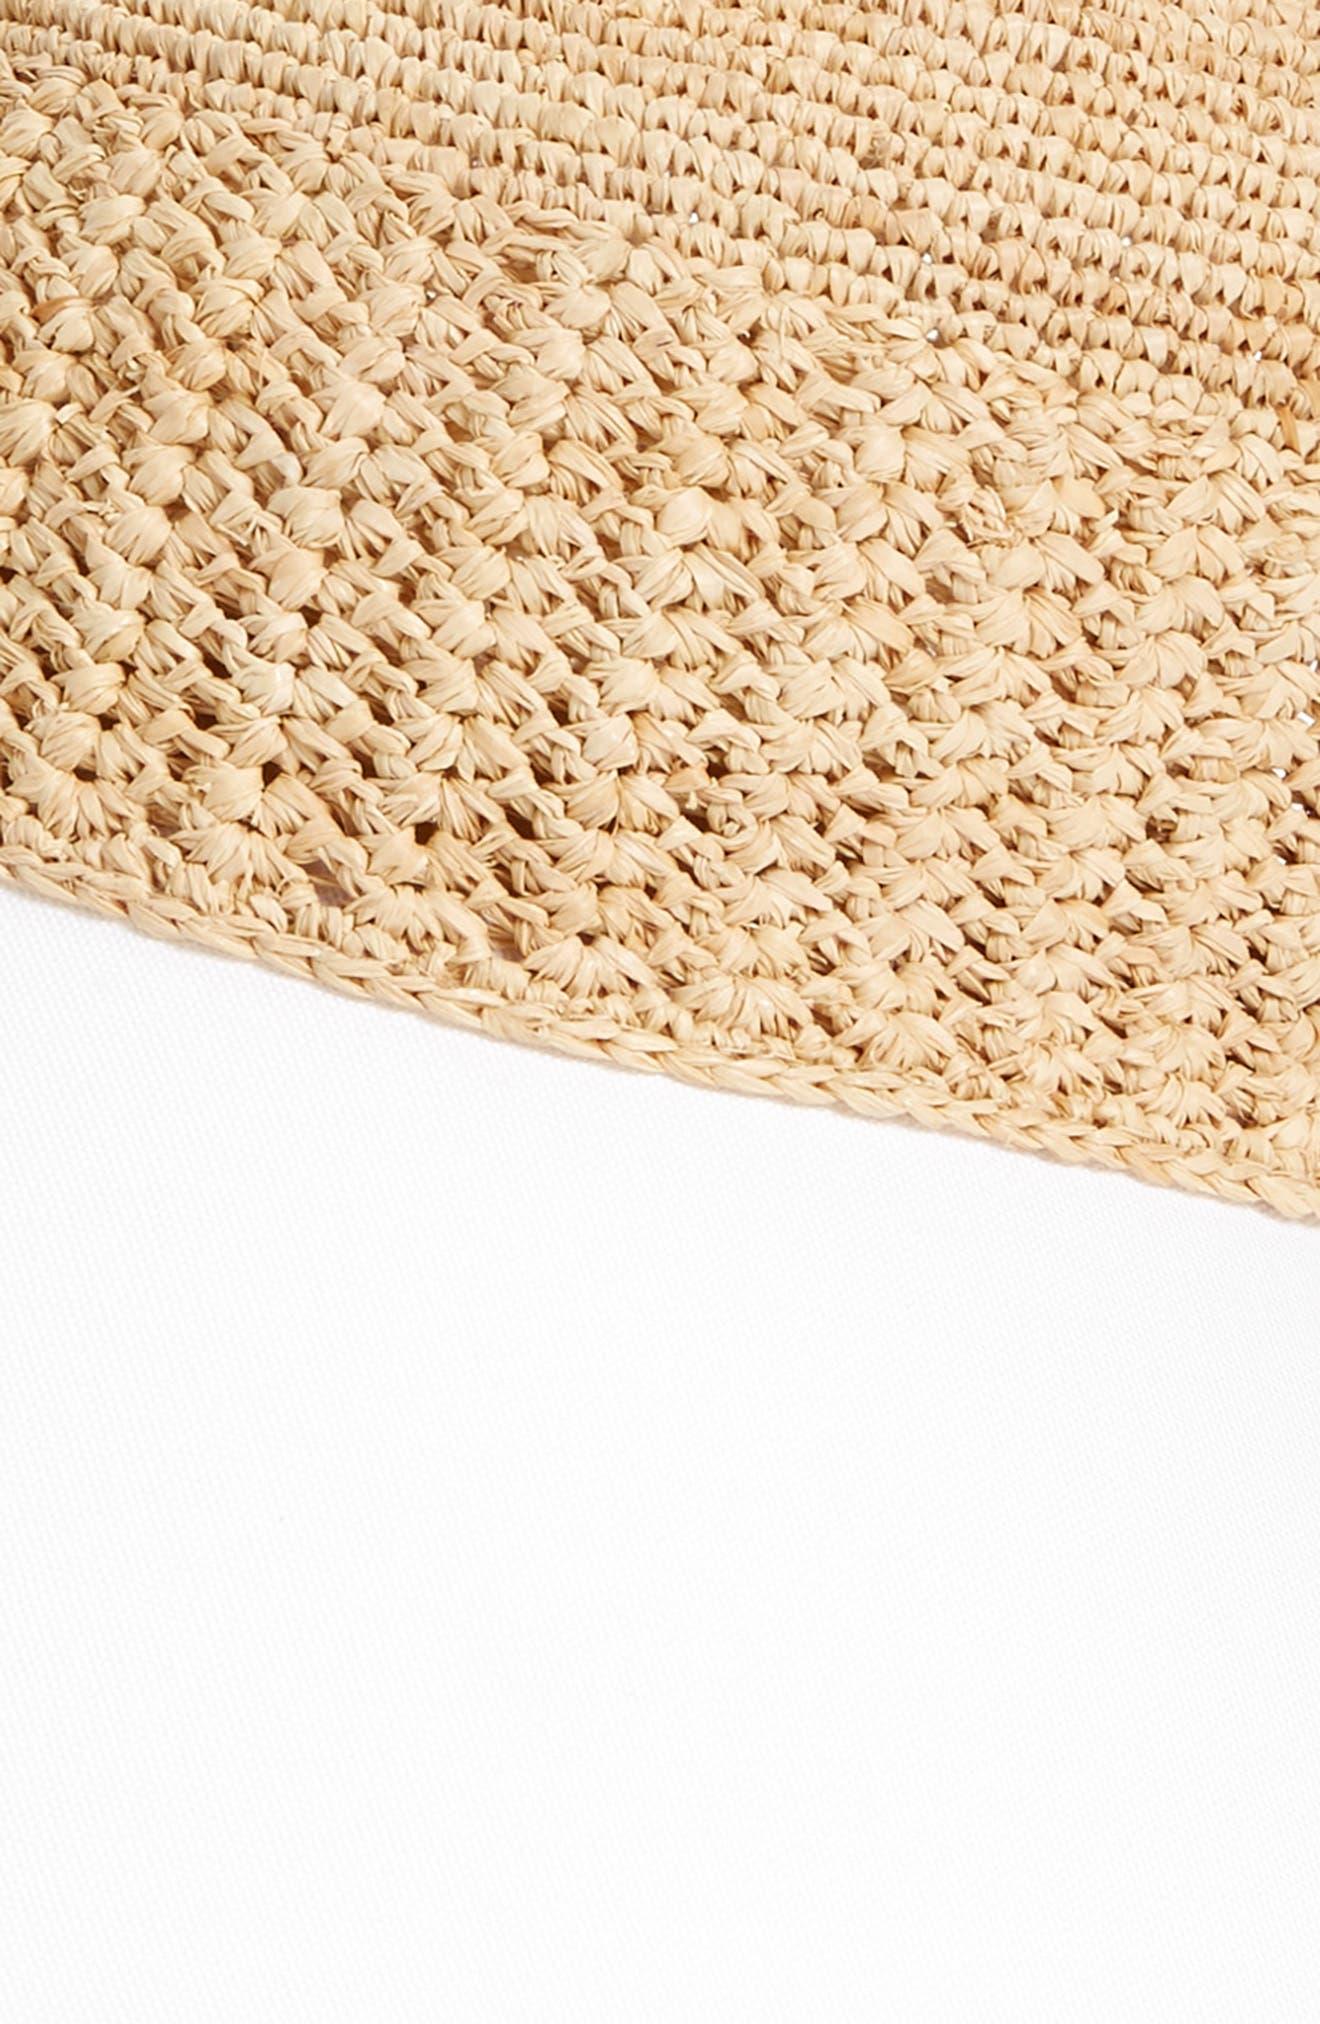 Wide Peak Raffia & Cotton Cap,                             Alternate thumbnail 2, color,                             Natural/ White